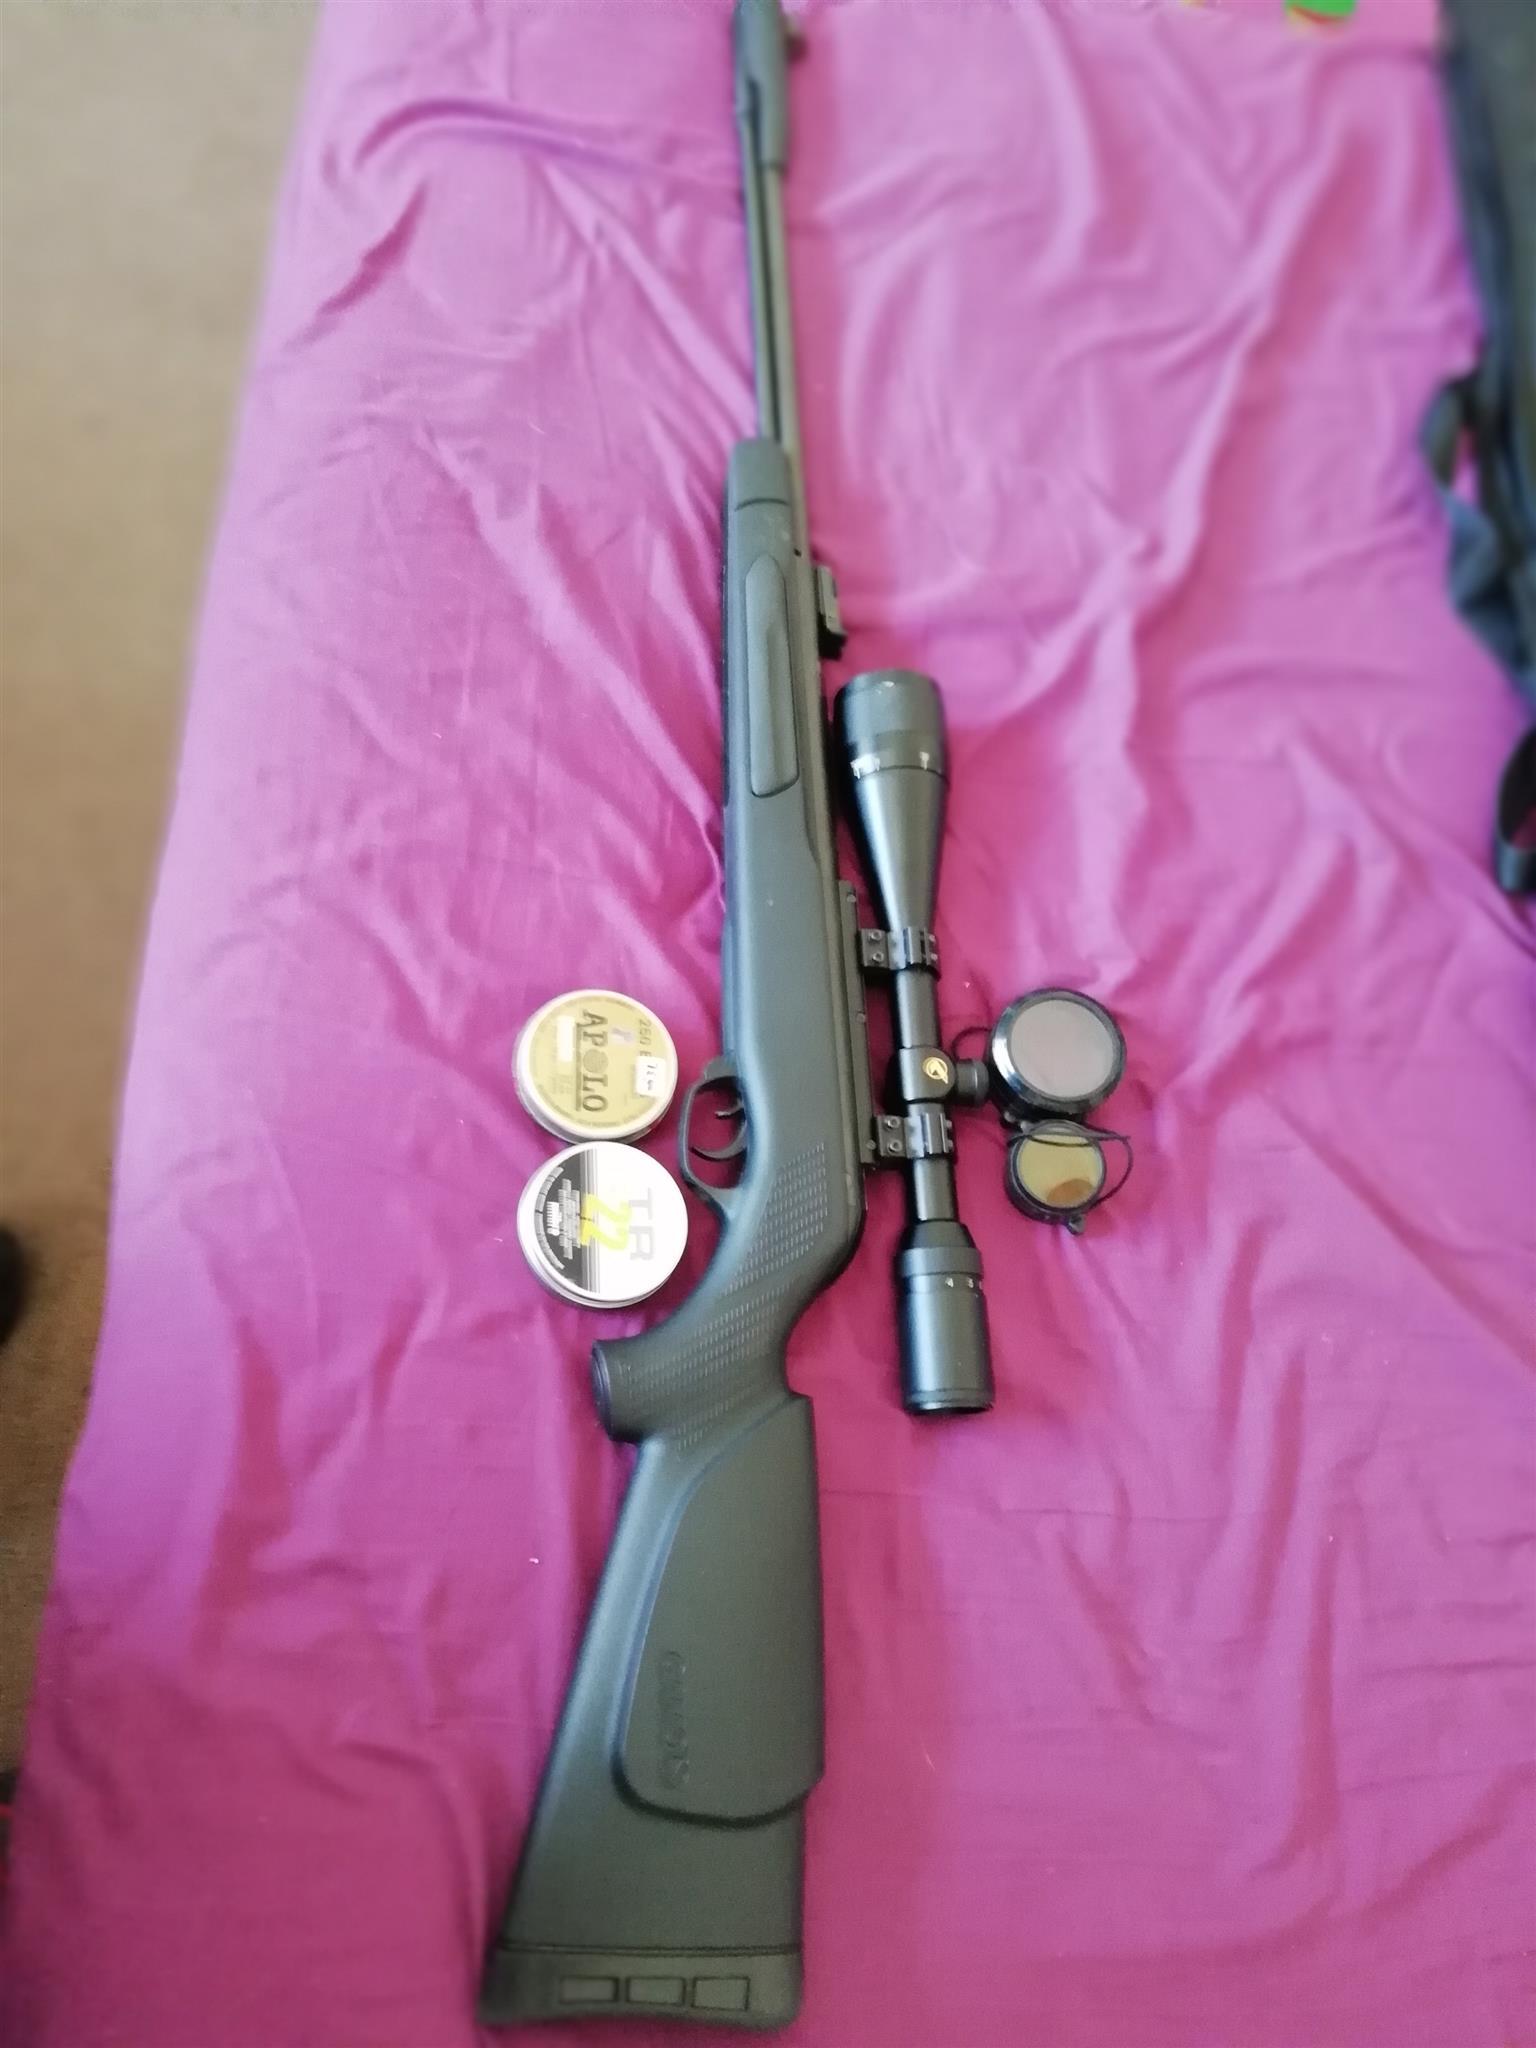 Gamo air rifle for sale | Junk Mail